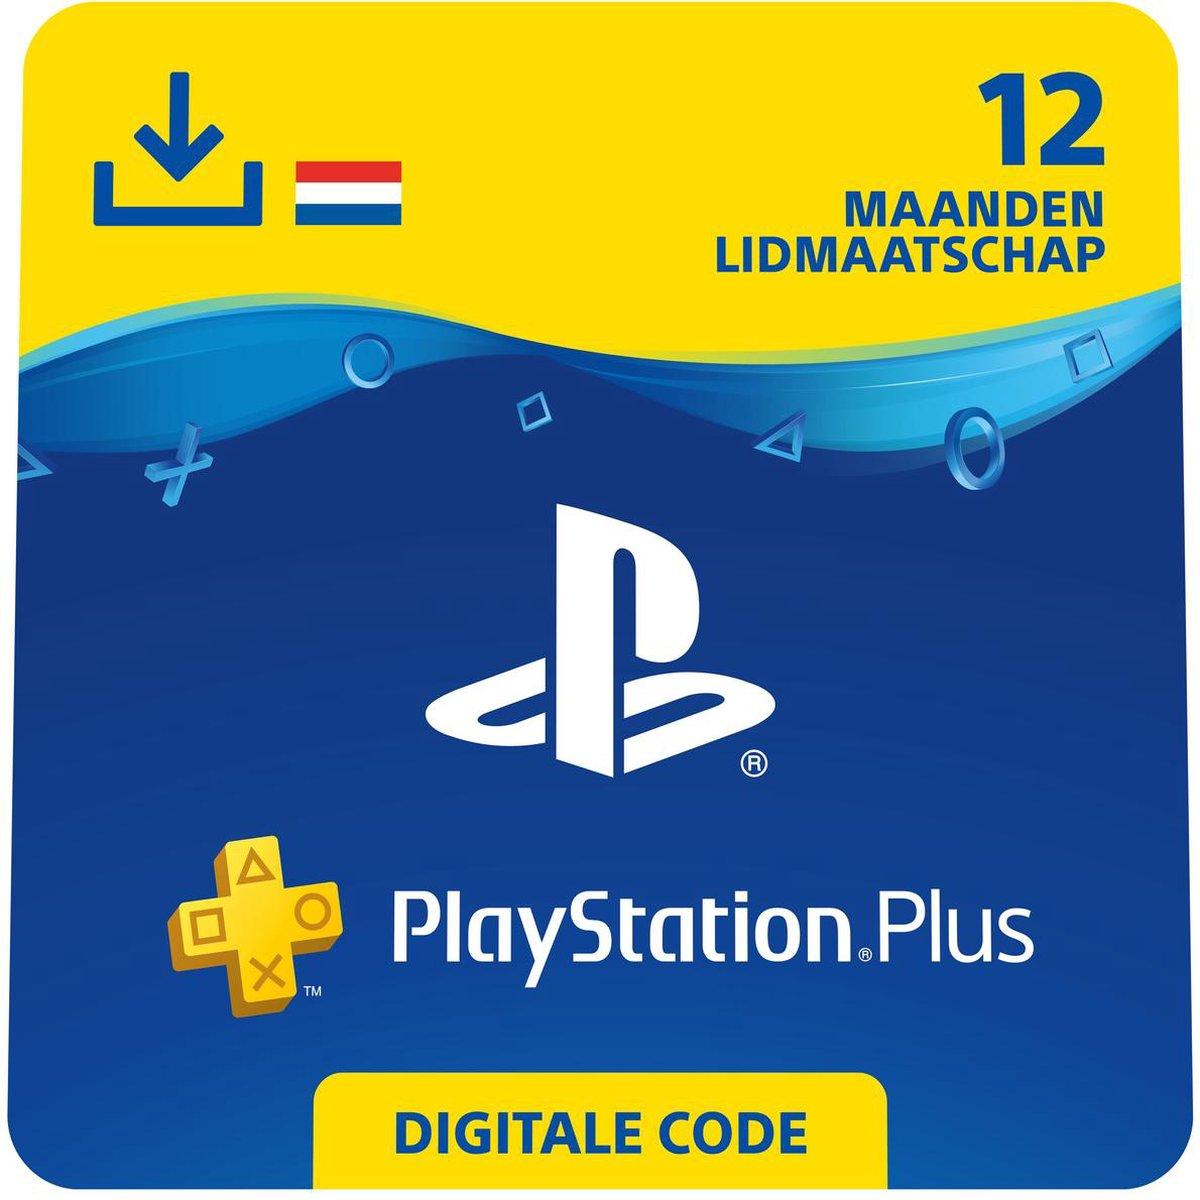 Sony Playstation Plus: 12 Maanden Lidmaatschap – PSN PlayStation Network – NL